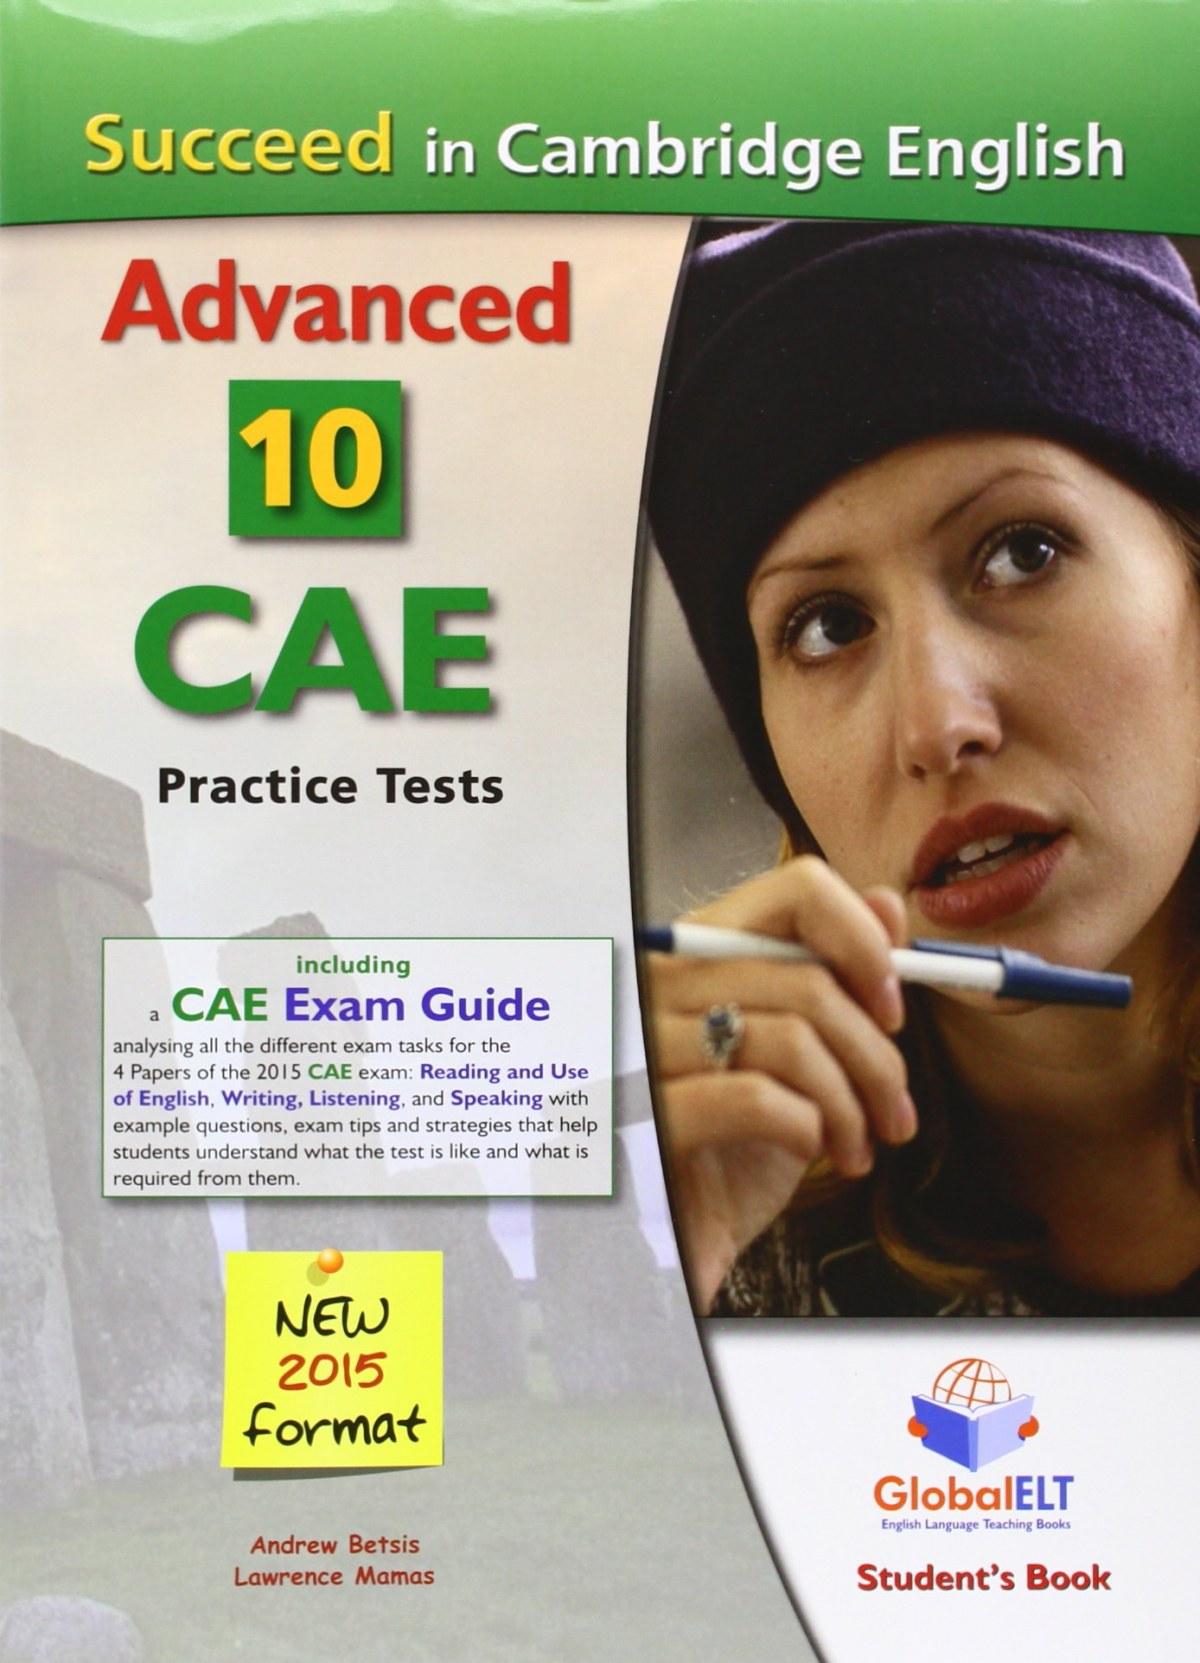 Succeed cambridge english advanced 10 cae